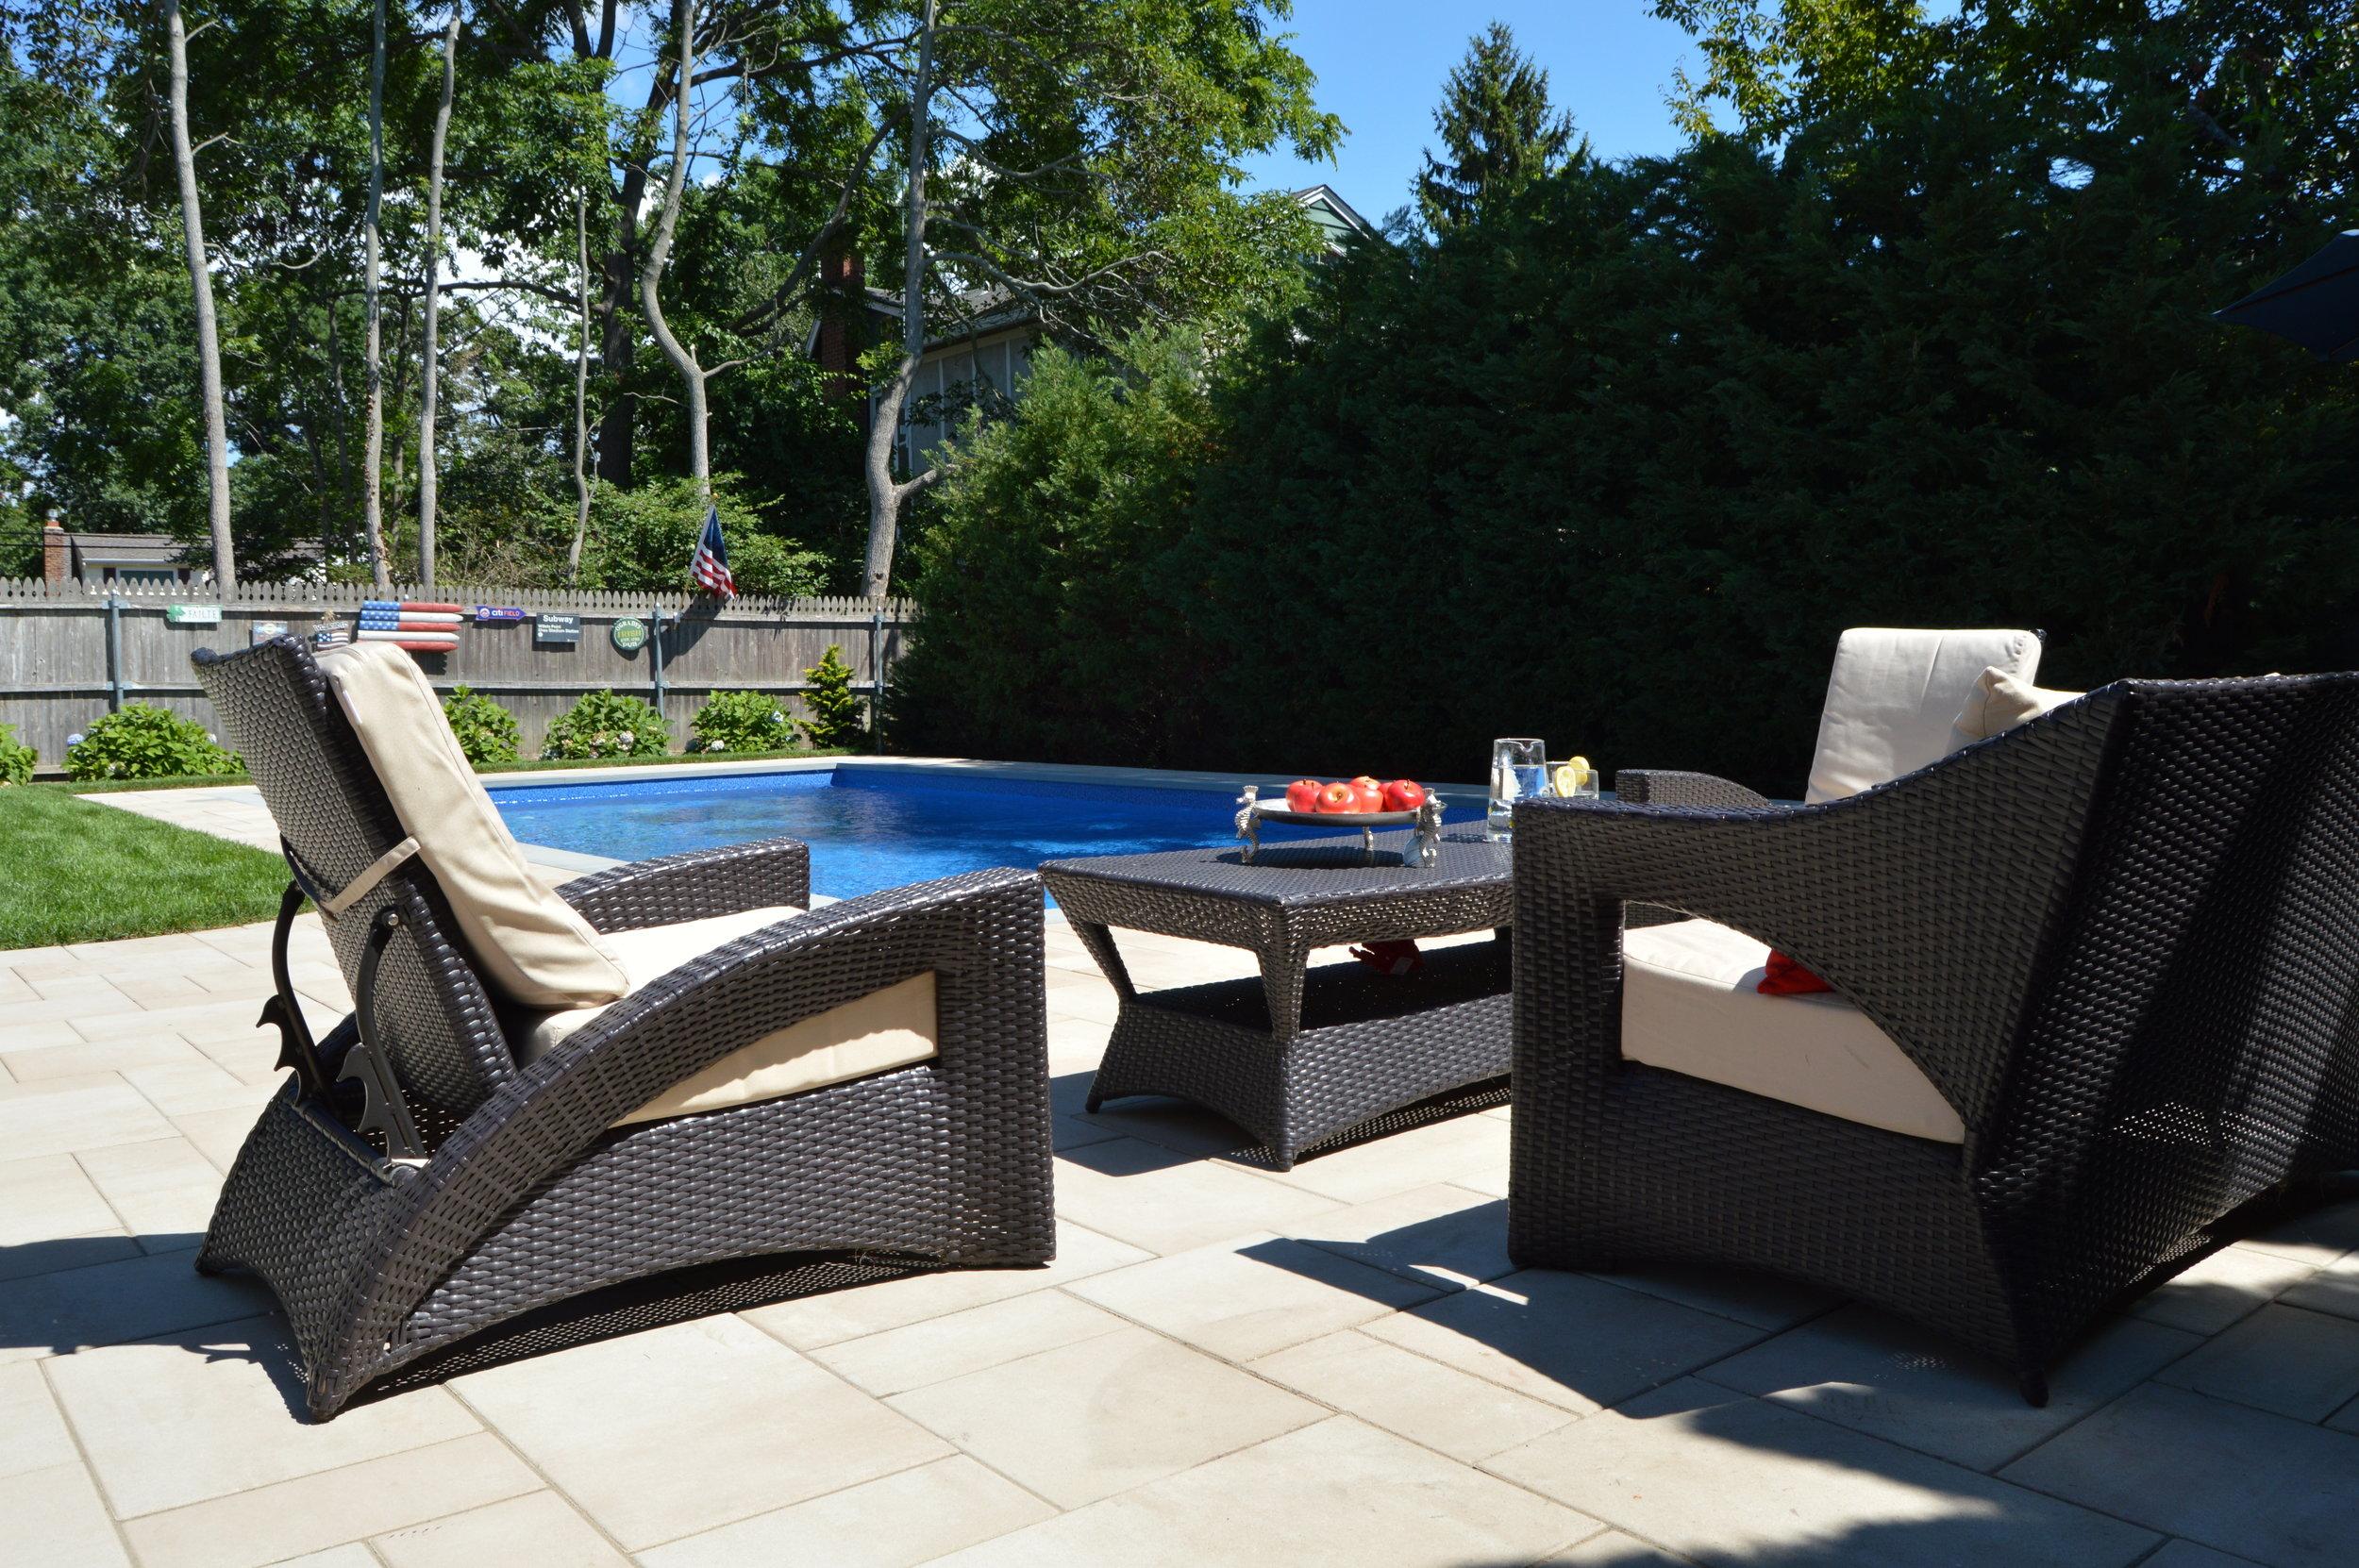 Babylon, NY swimming pool patio and landscape design